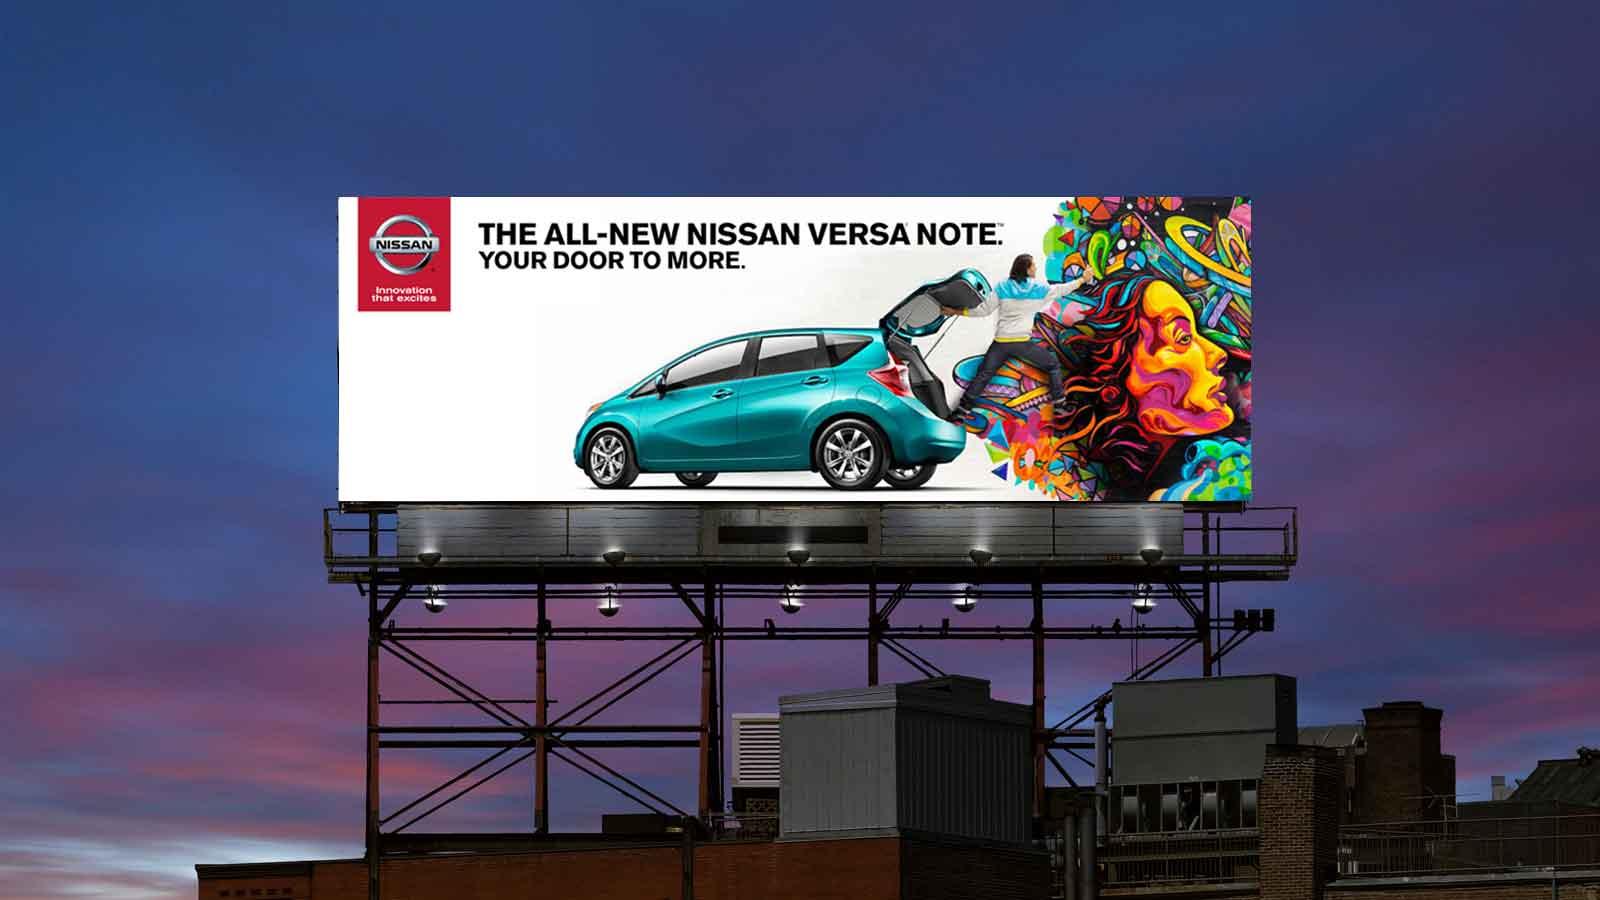 nissan-verta-note-billboard_3.jpg